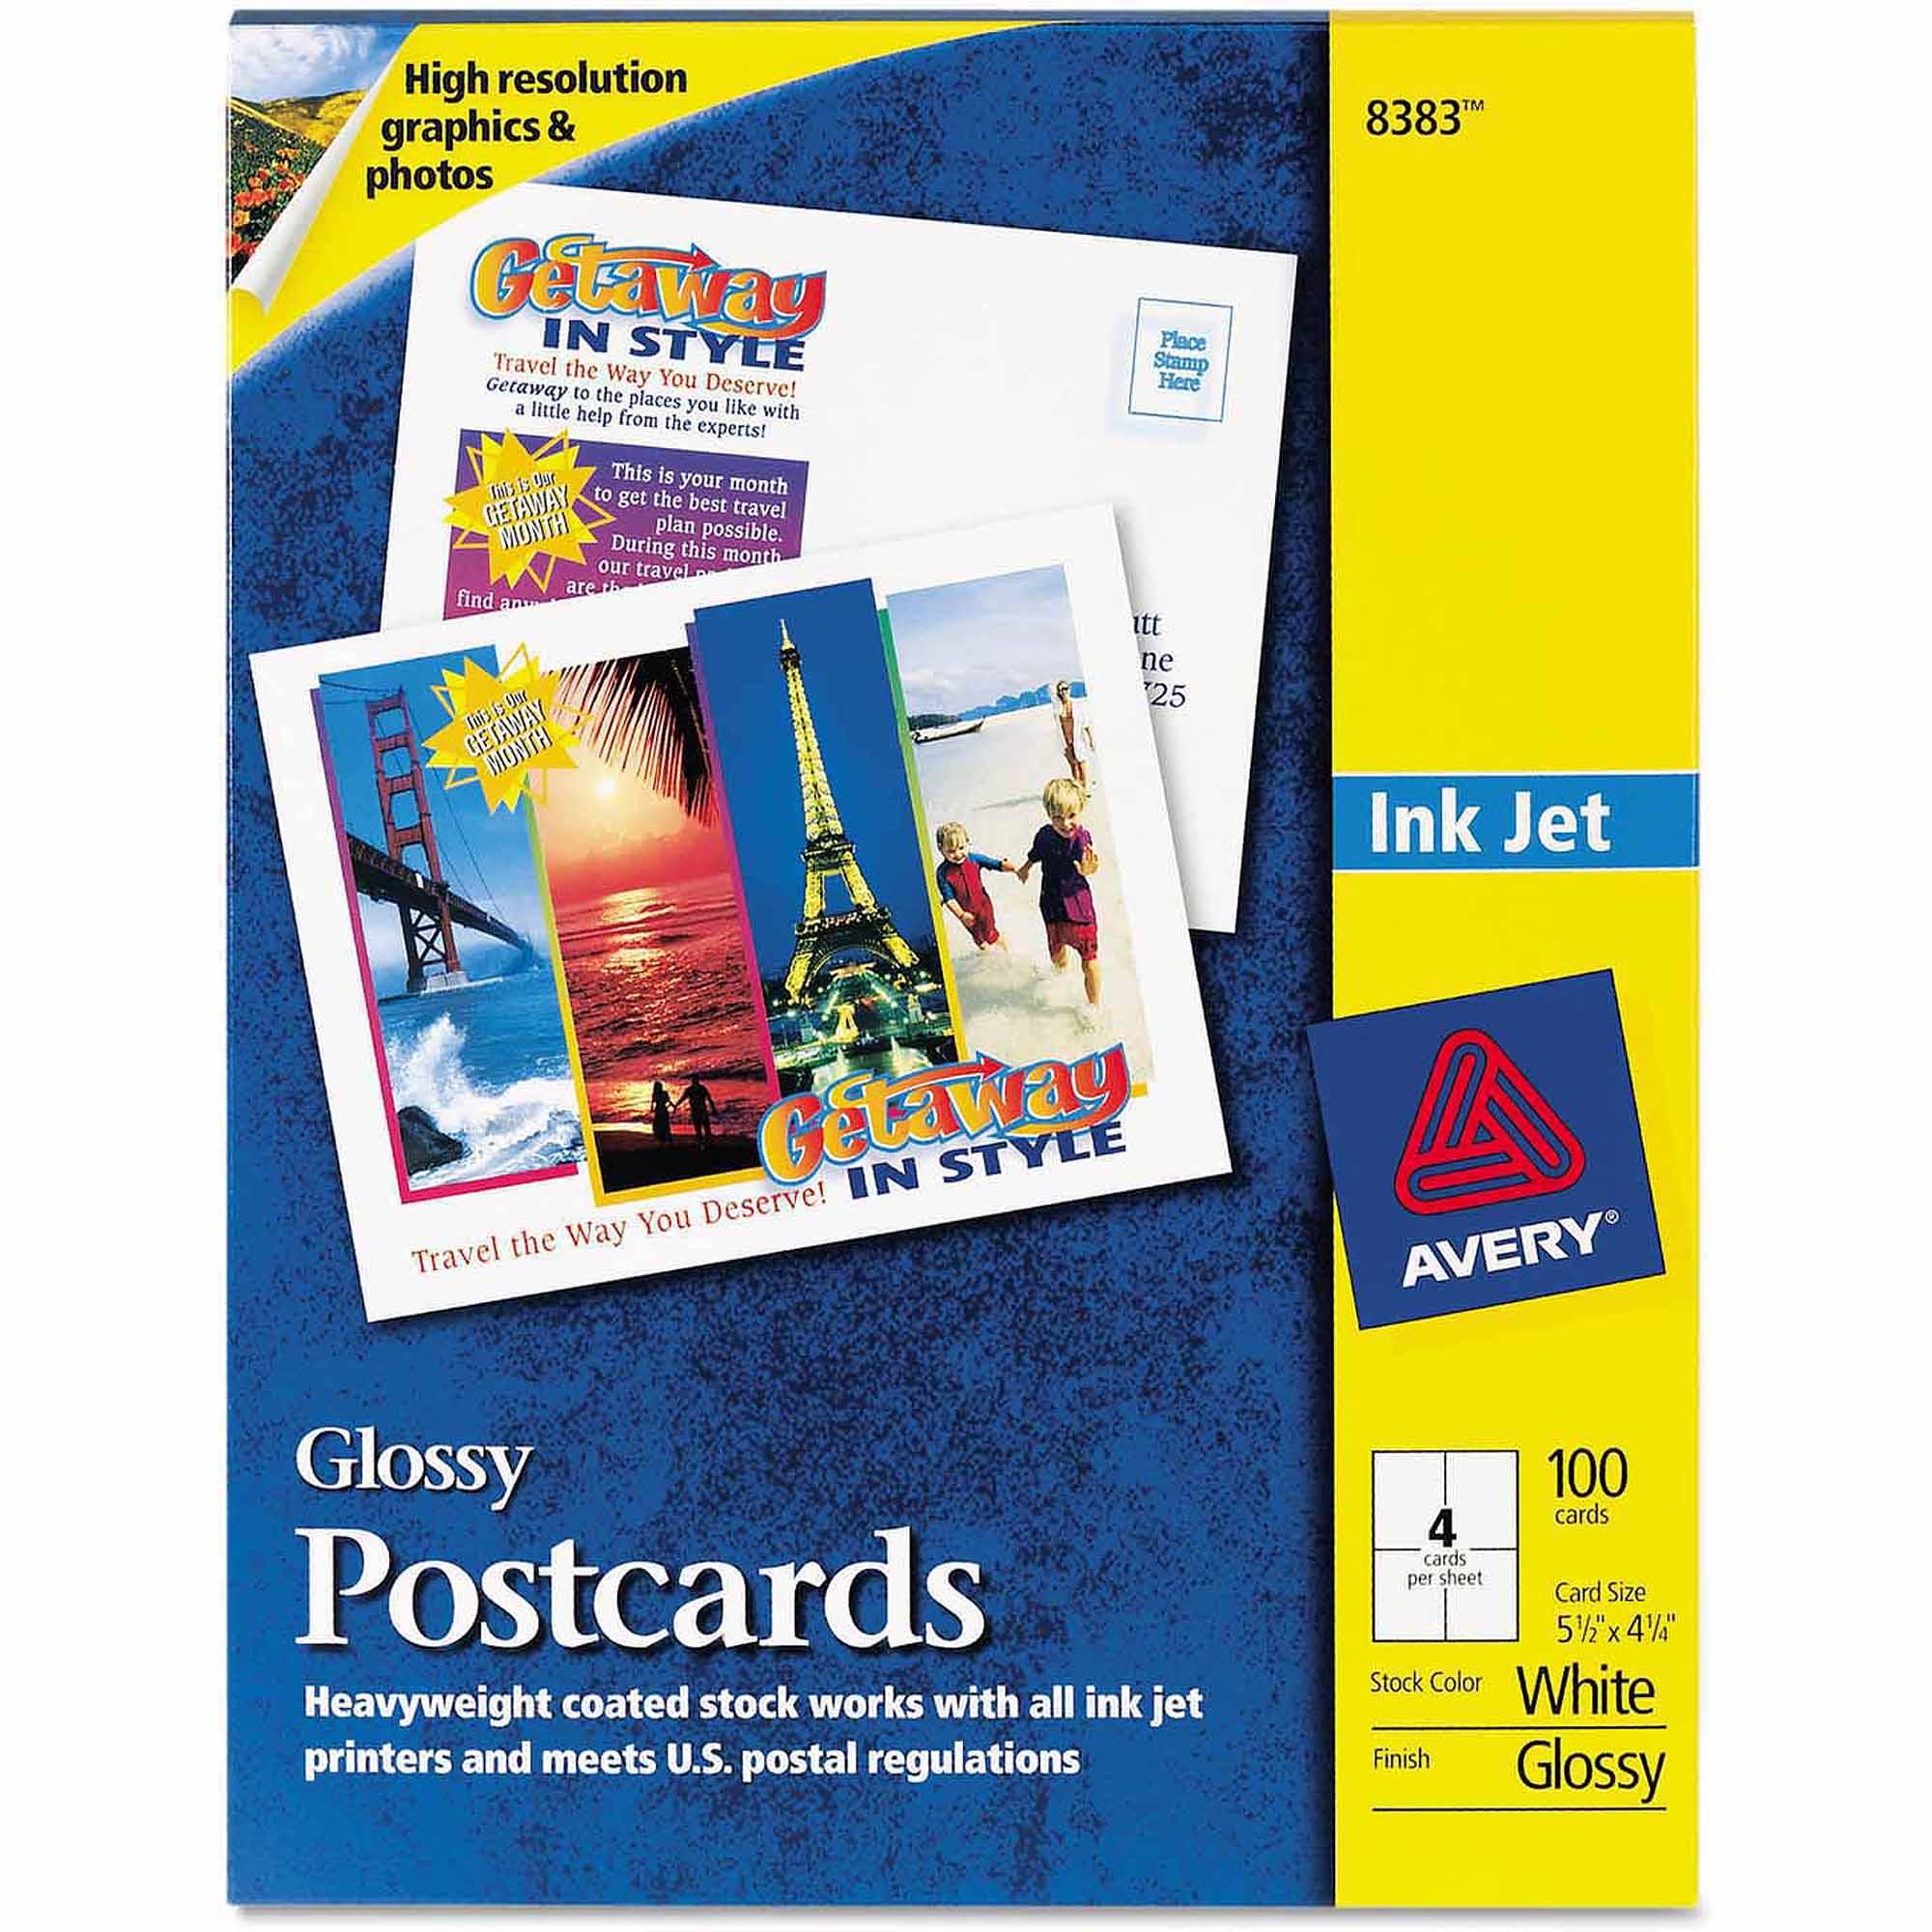 Avery Photo-Quality Glossy Postcards for Inkjet Printers, 4-1/4 x 5-1/2, White, 100/Pk